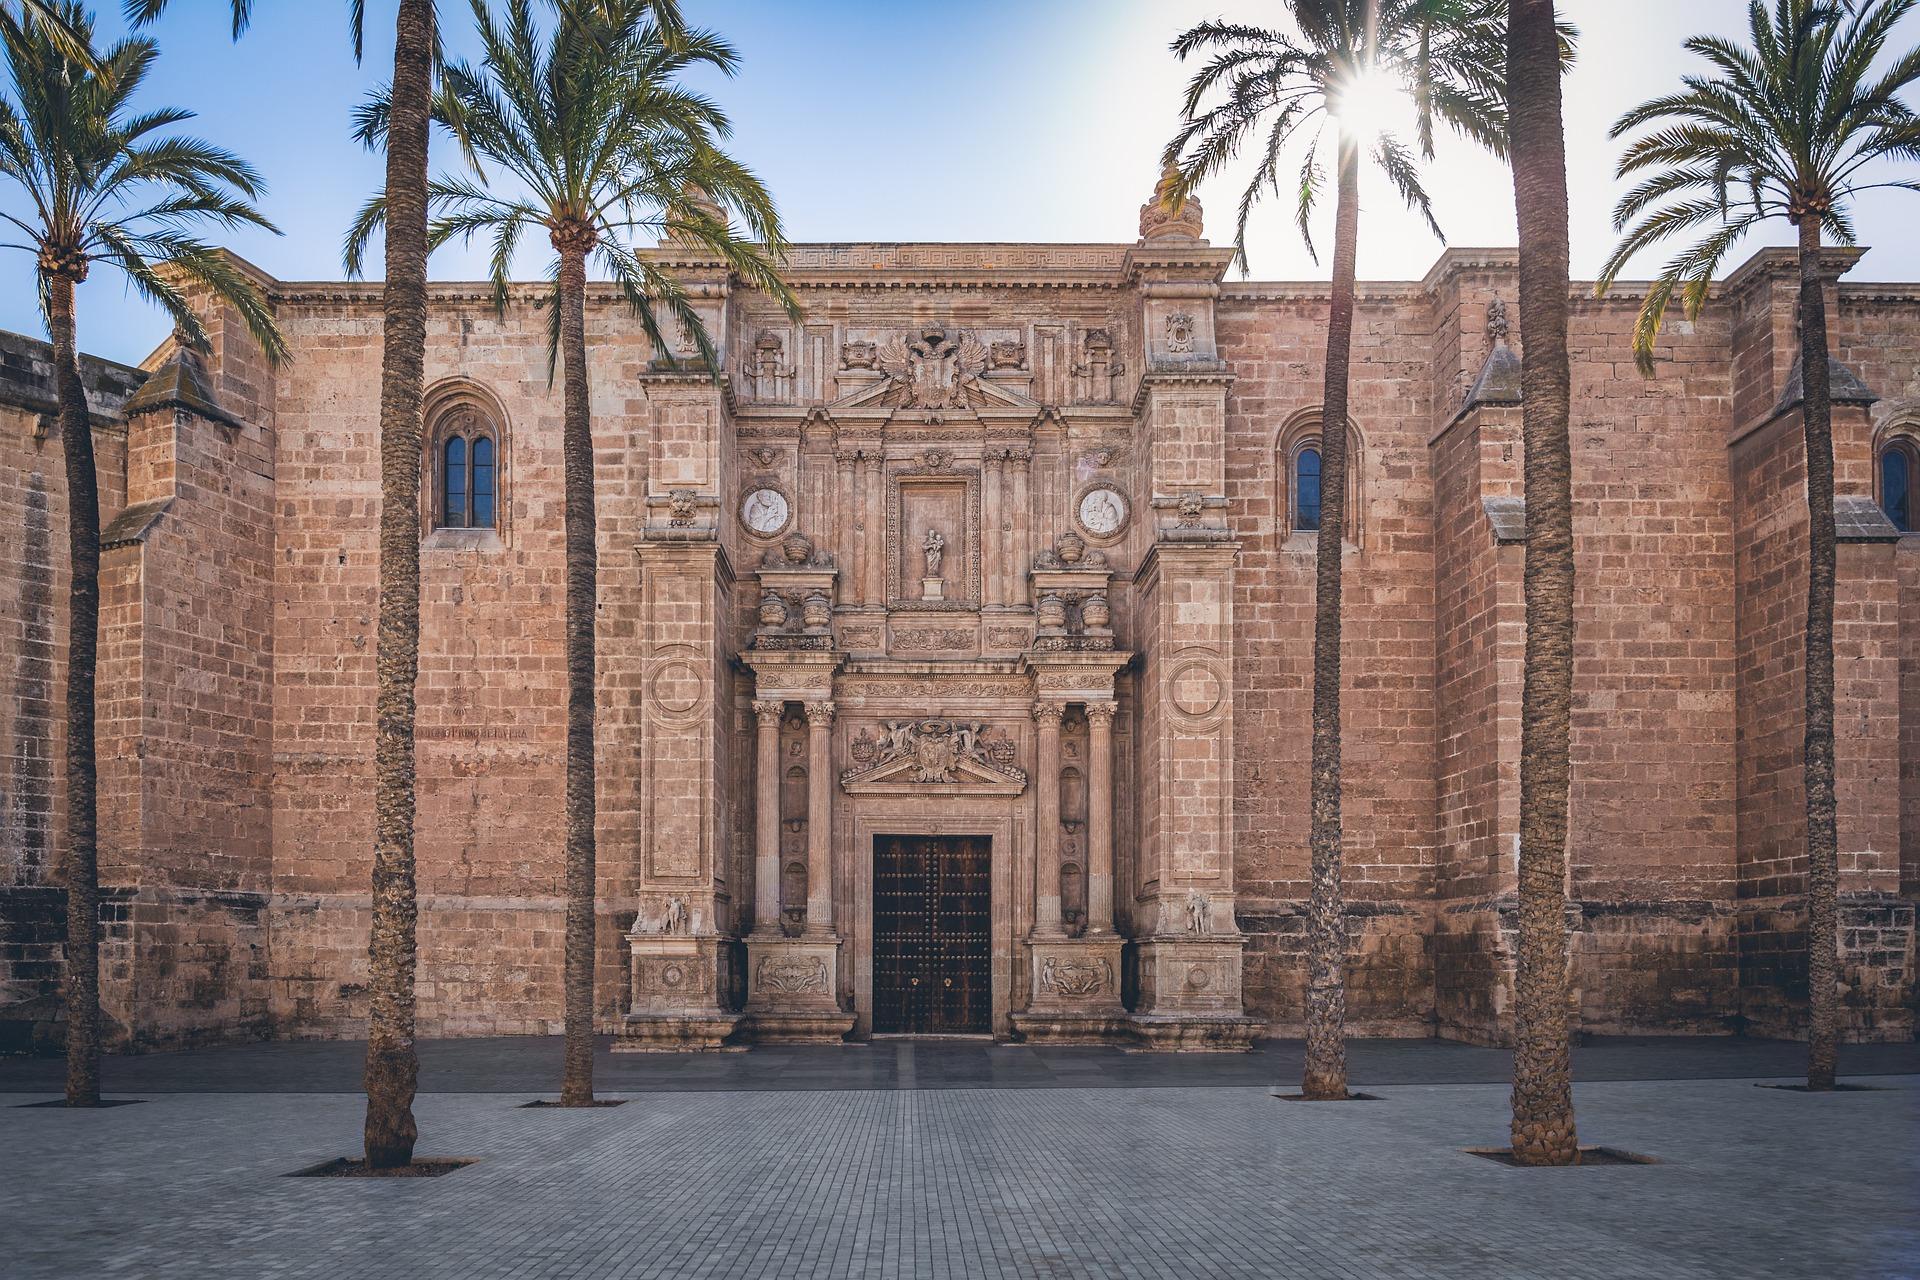 almeria-cathedral-exterior-pixabay--4001001_1920.jpg